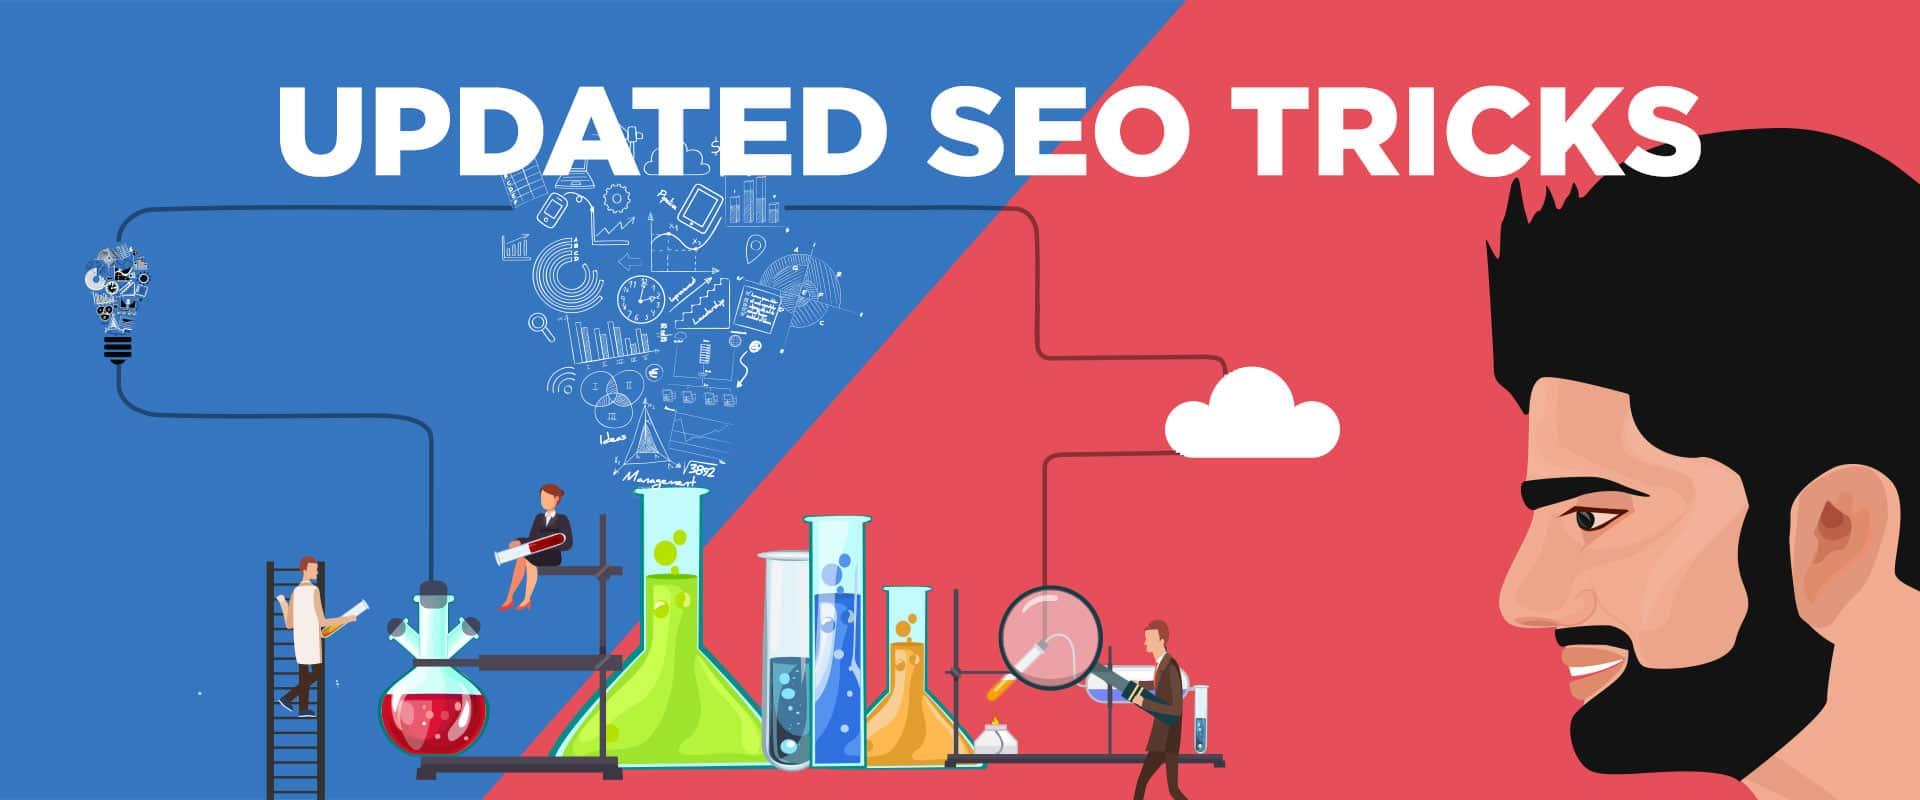 updated-seo-tricks-seo-techniques-search-engine-optimisation-techniques